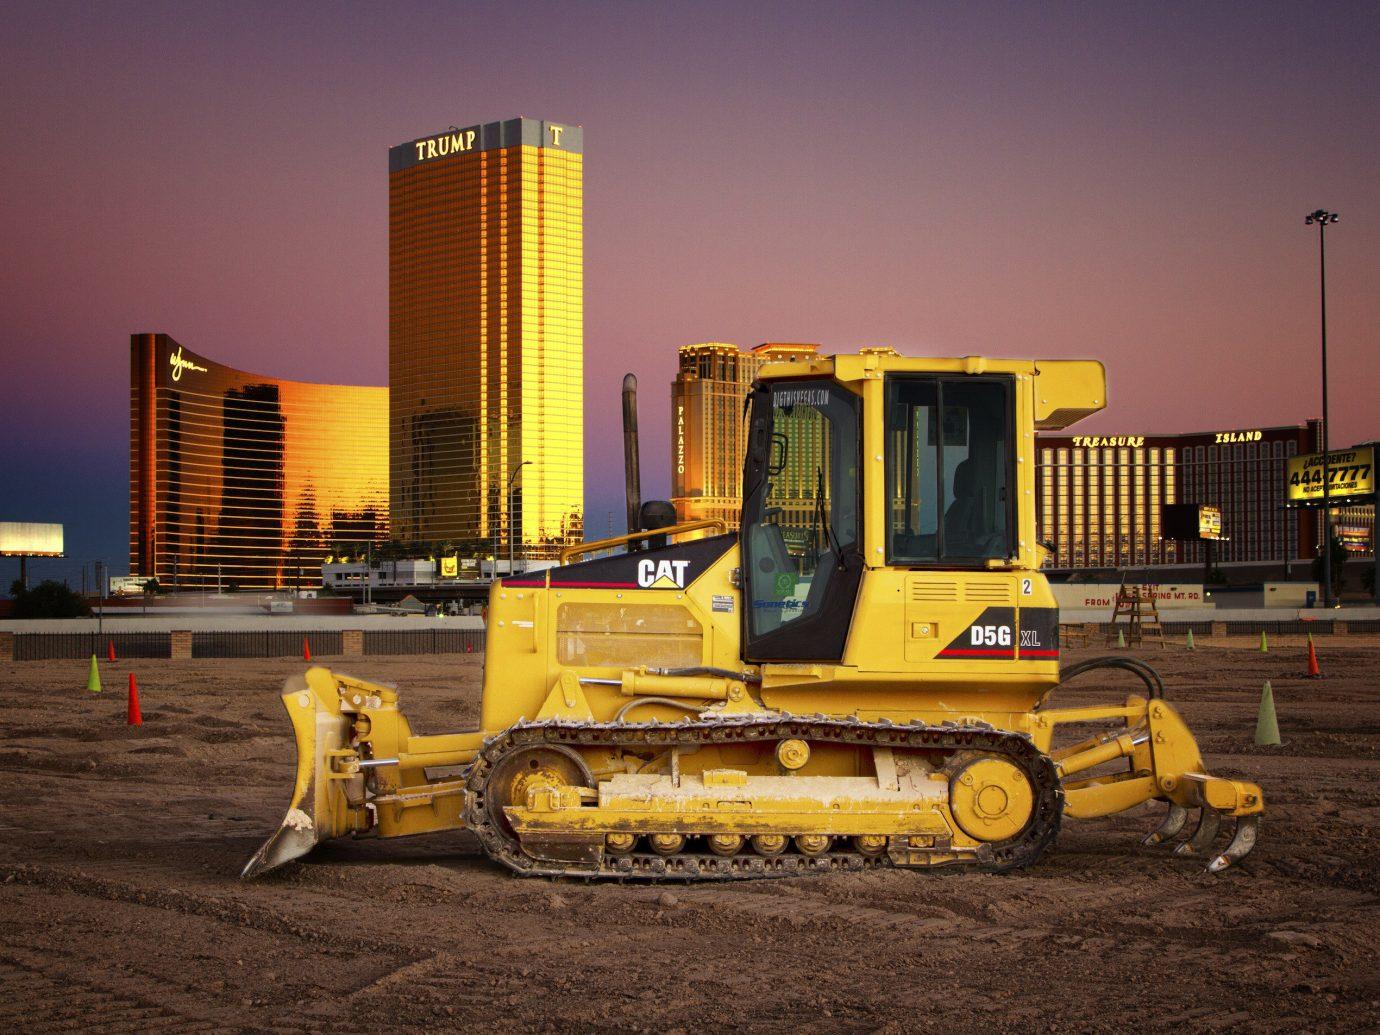 Trip Ideas sky outdoor truck yellow transport vehicle construction equipment asphalt bulldozer power shovel construction equipment